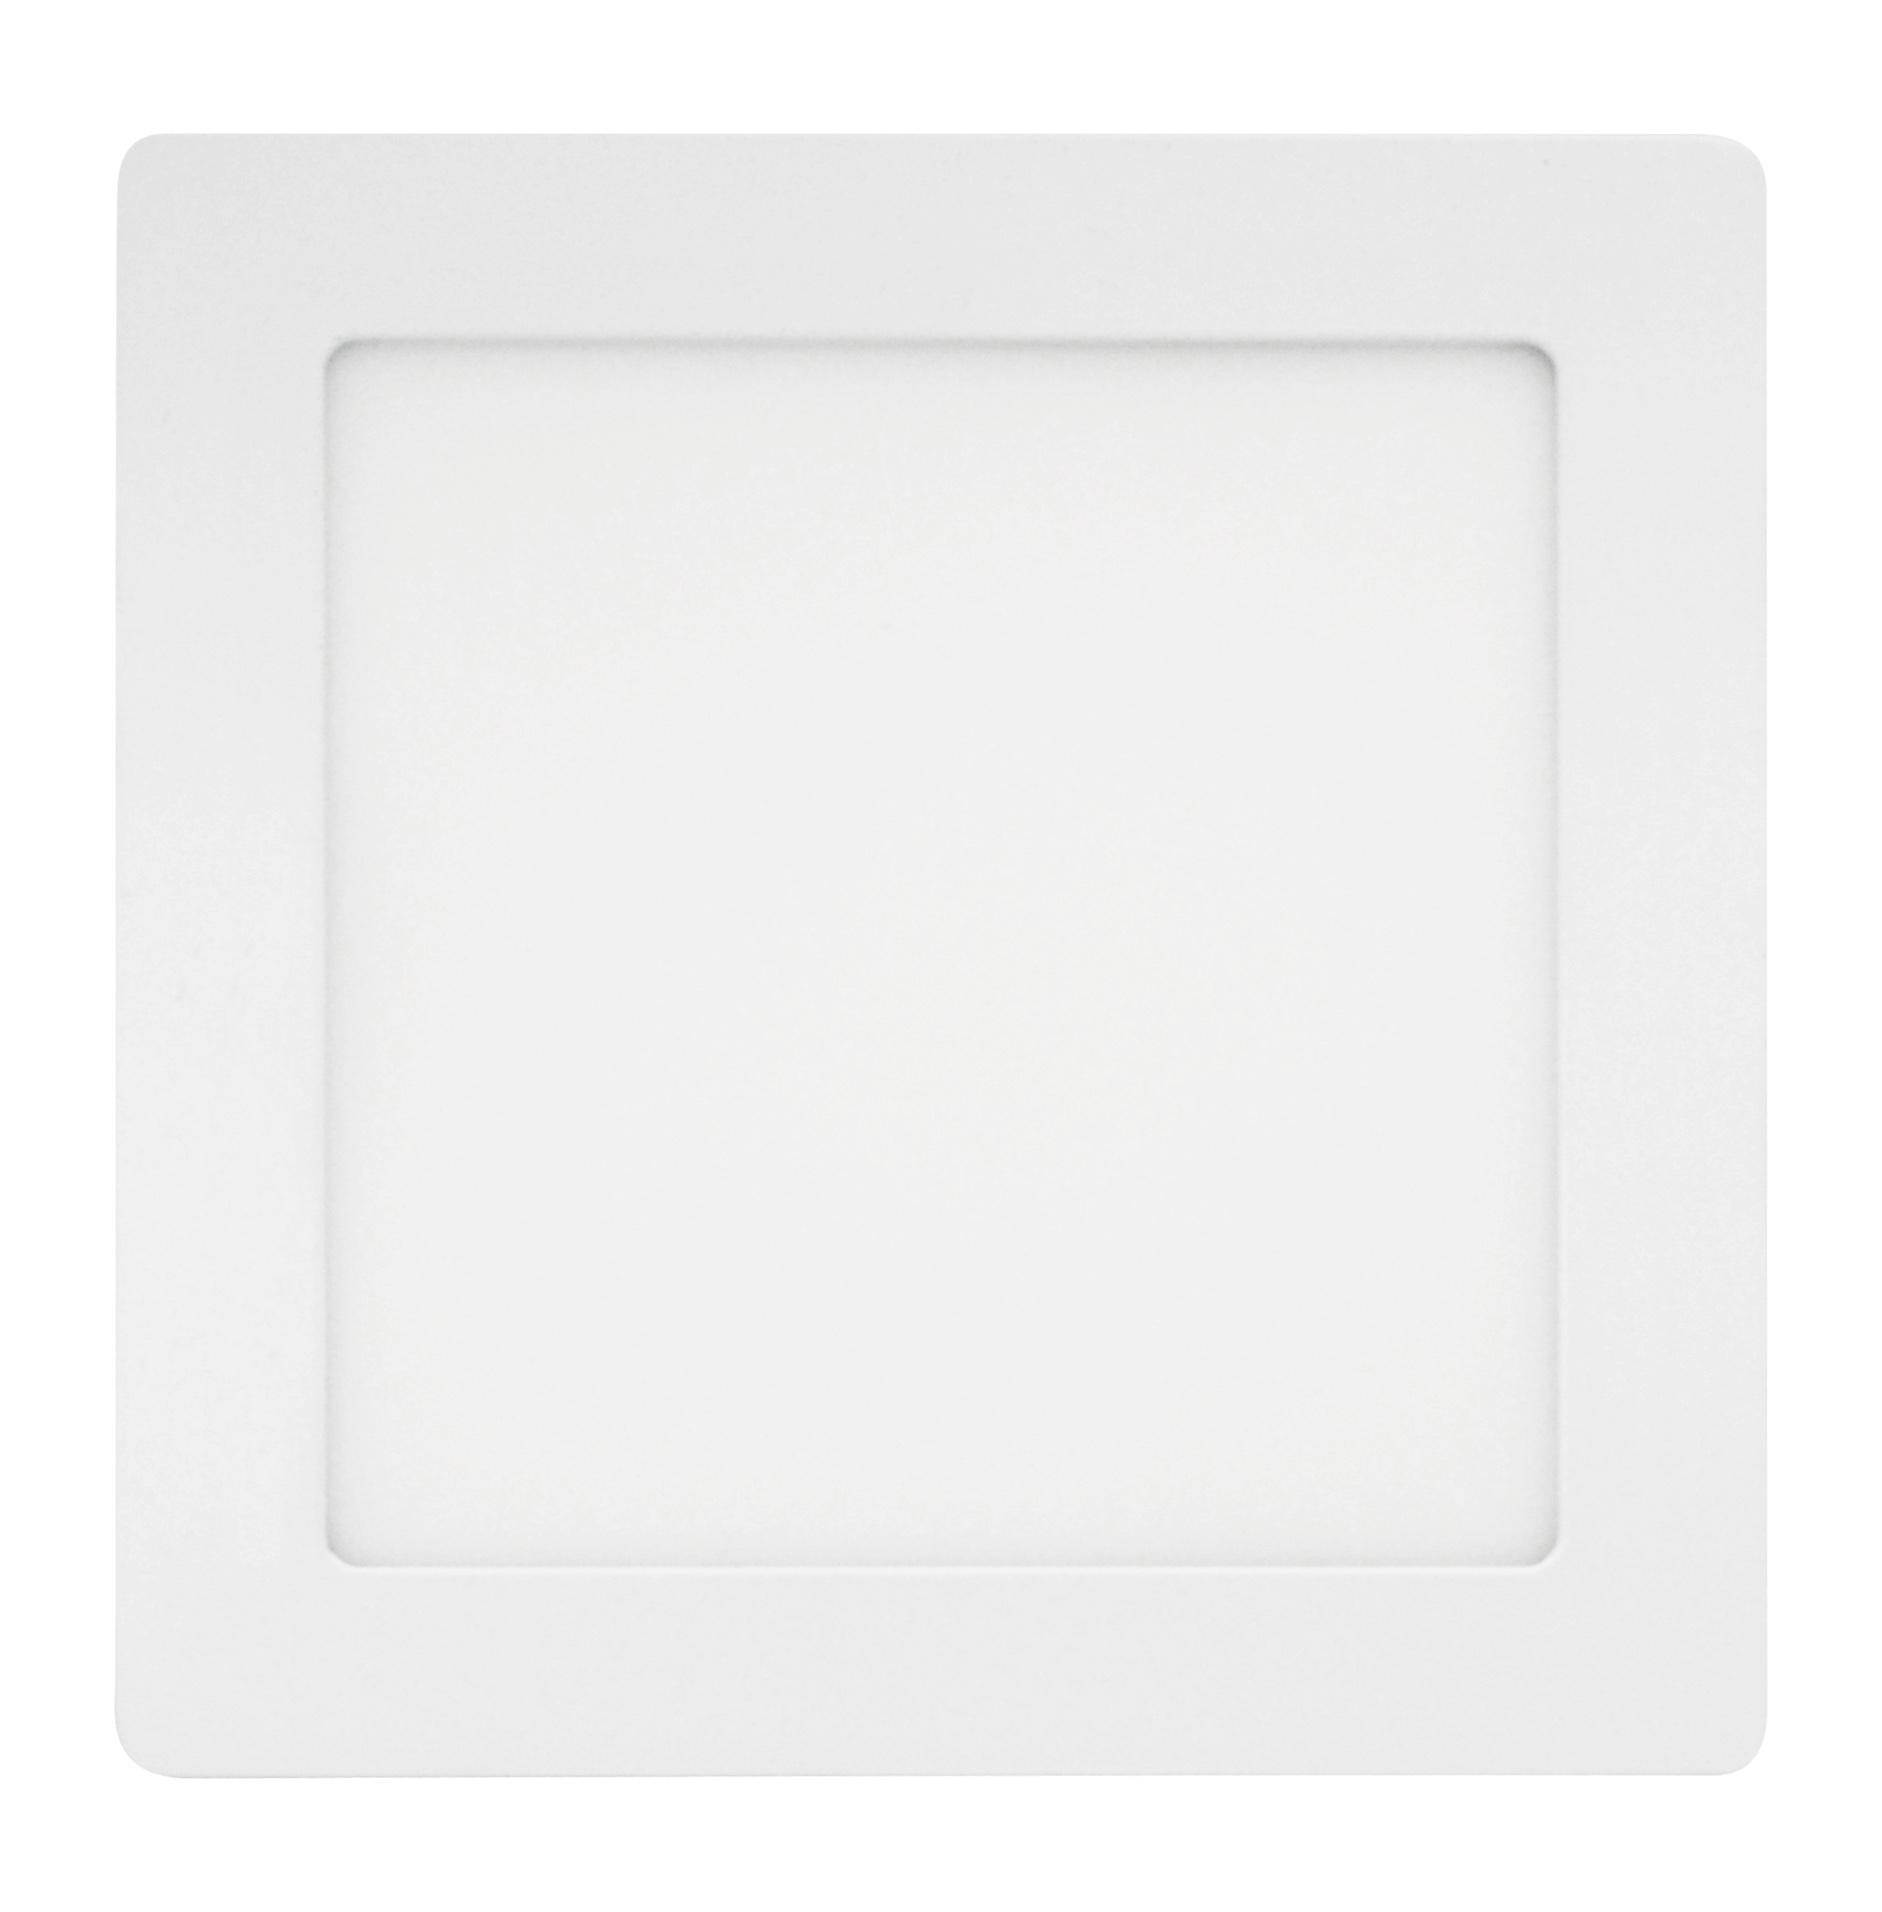 LED Lampu Panel 12 Watt Square Warm White Plafon Rumah Kantor Terang